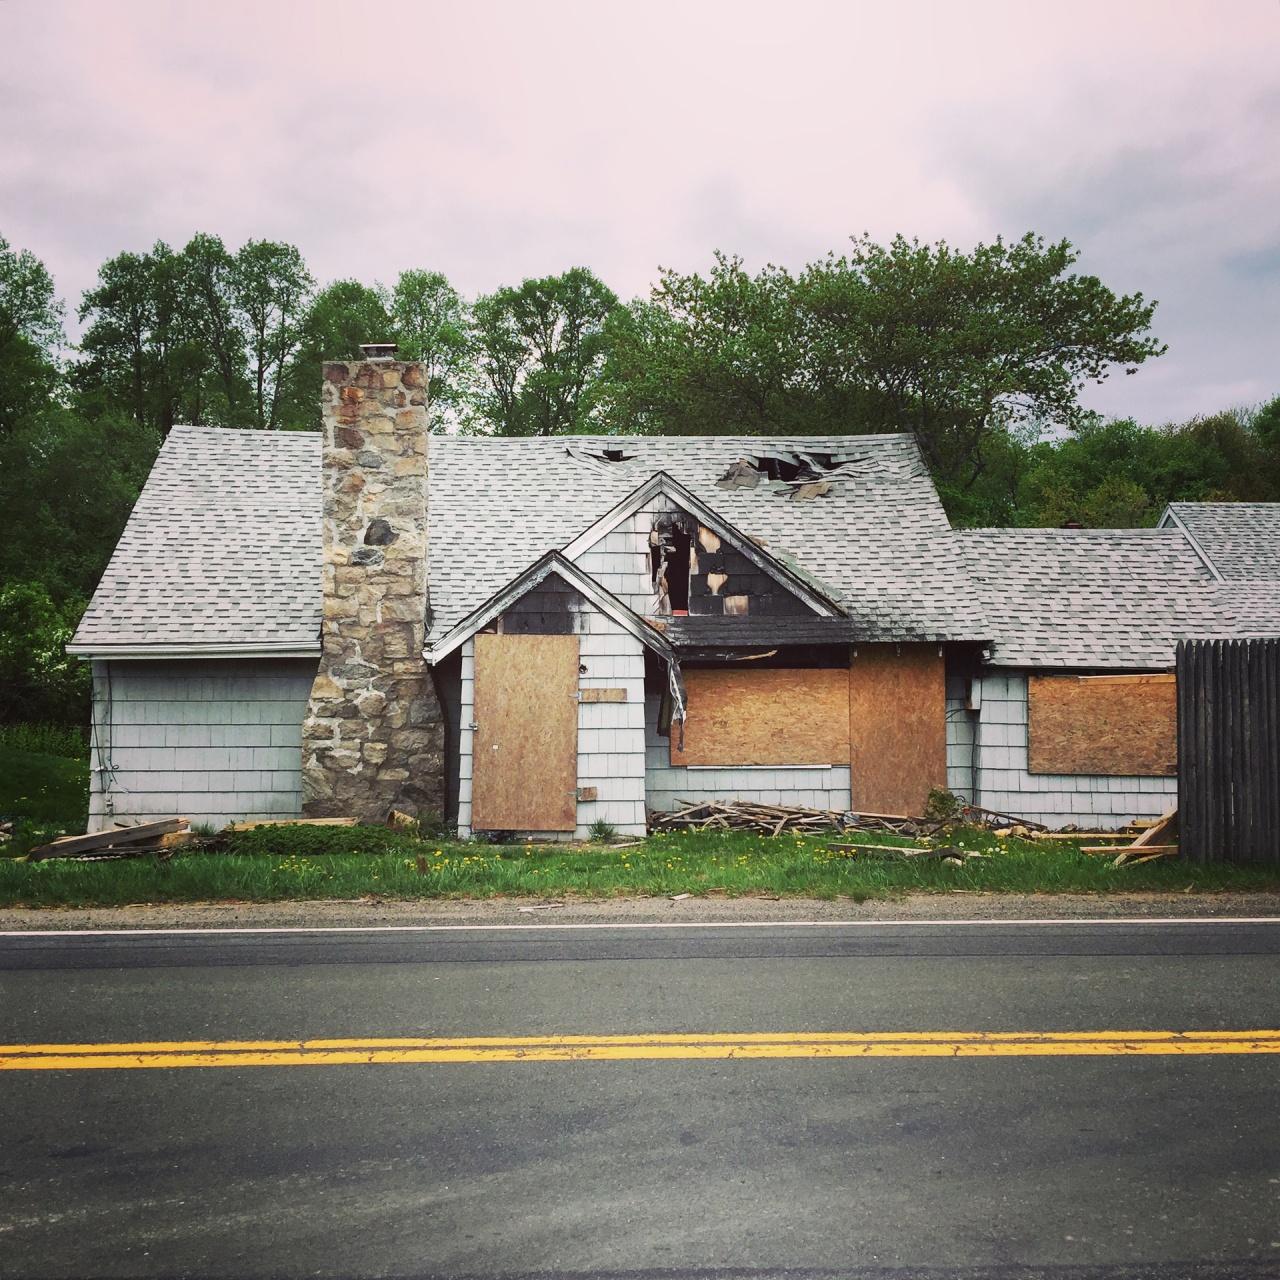 Suburban Landscape, South Salem, NY